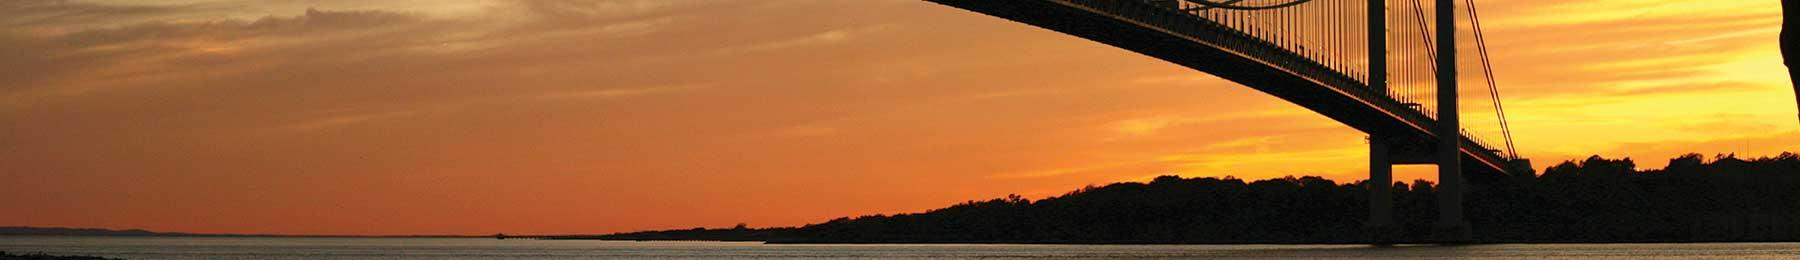 Bridge-with-sunset-skinny